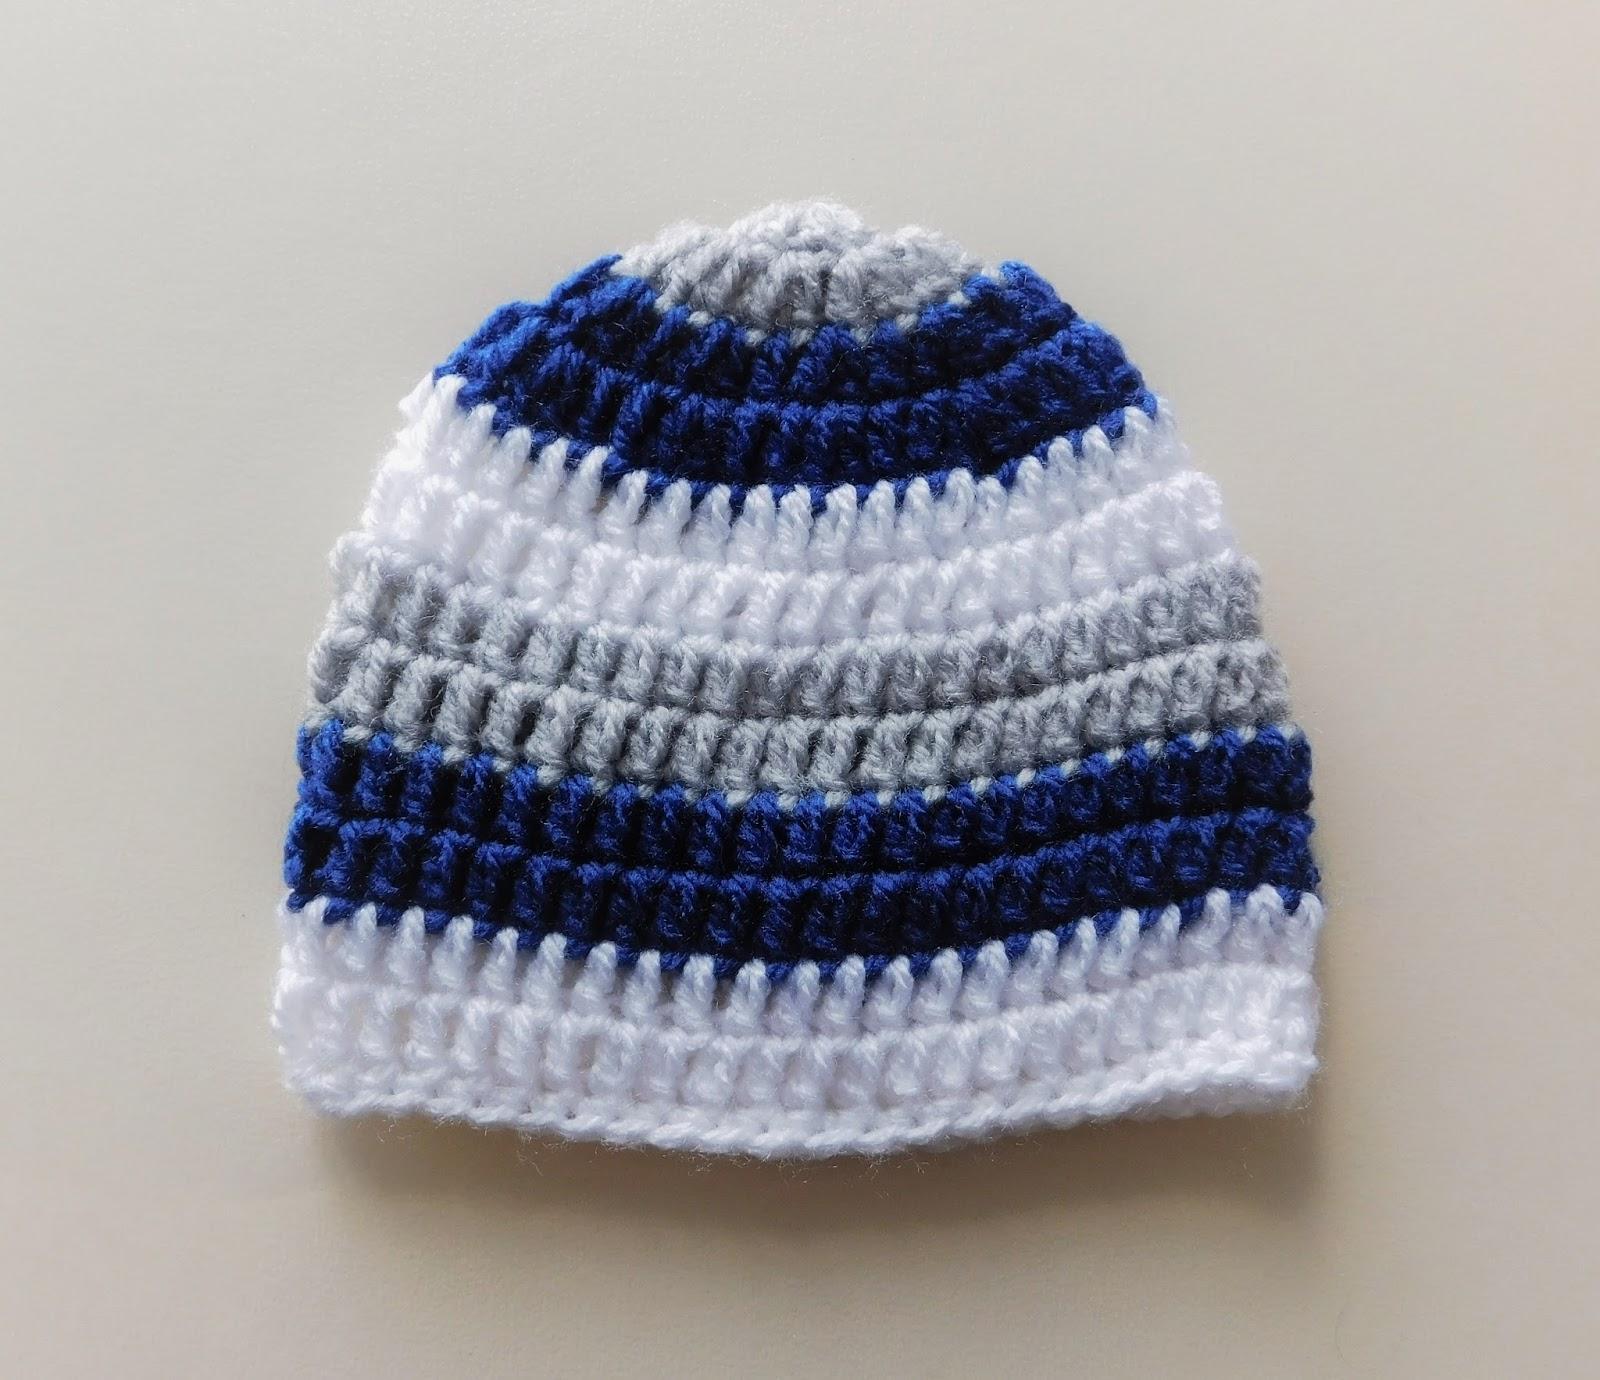 00ca177f Marianna's Lazy Daisy Days: Simple Stripes Crochet Baby Beanie Hat